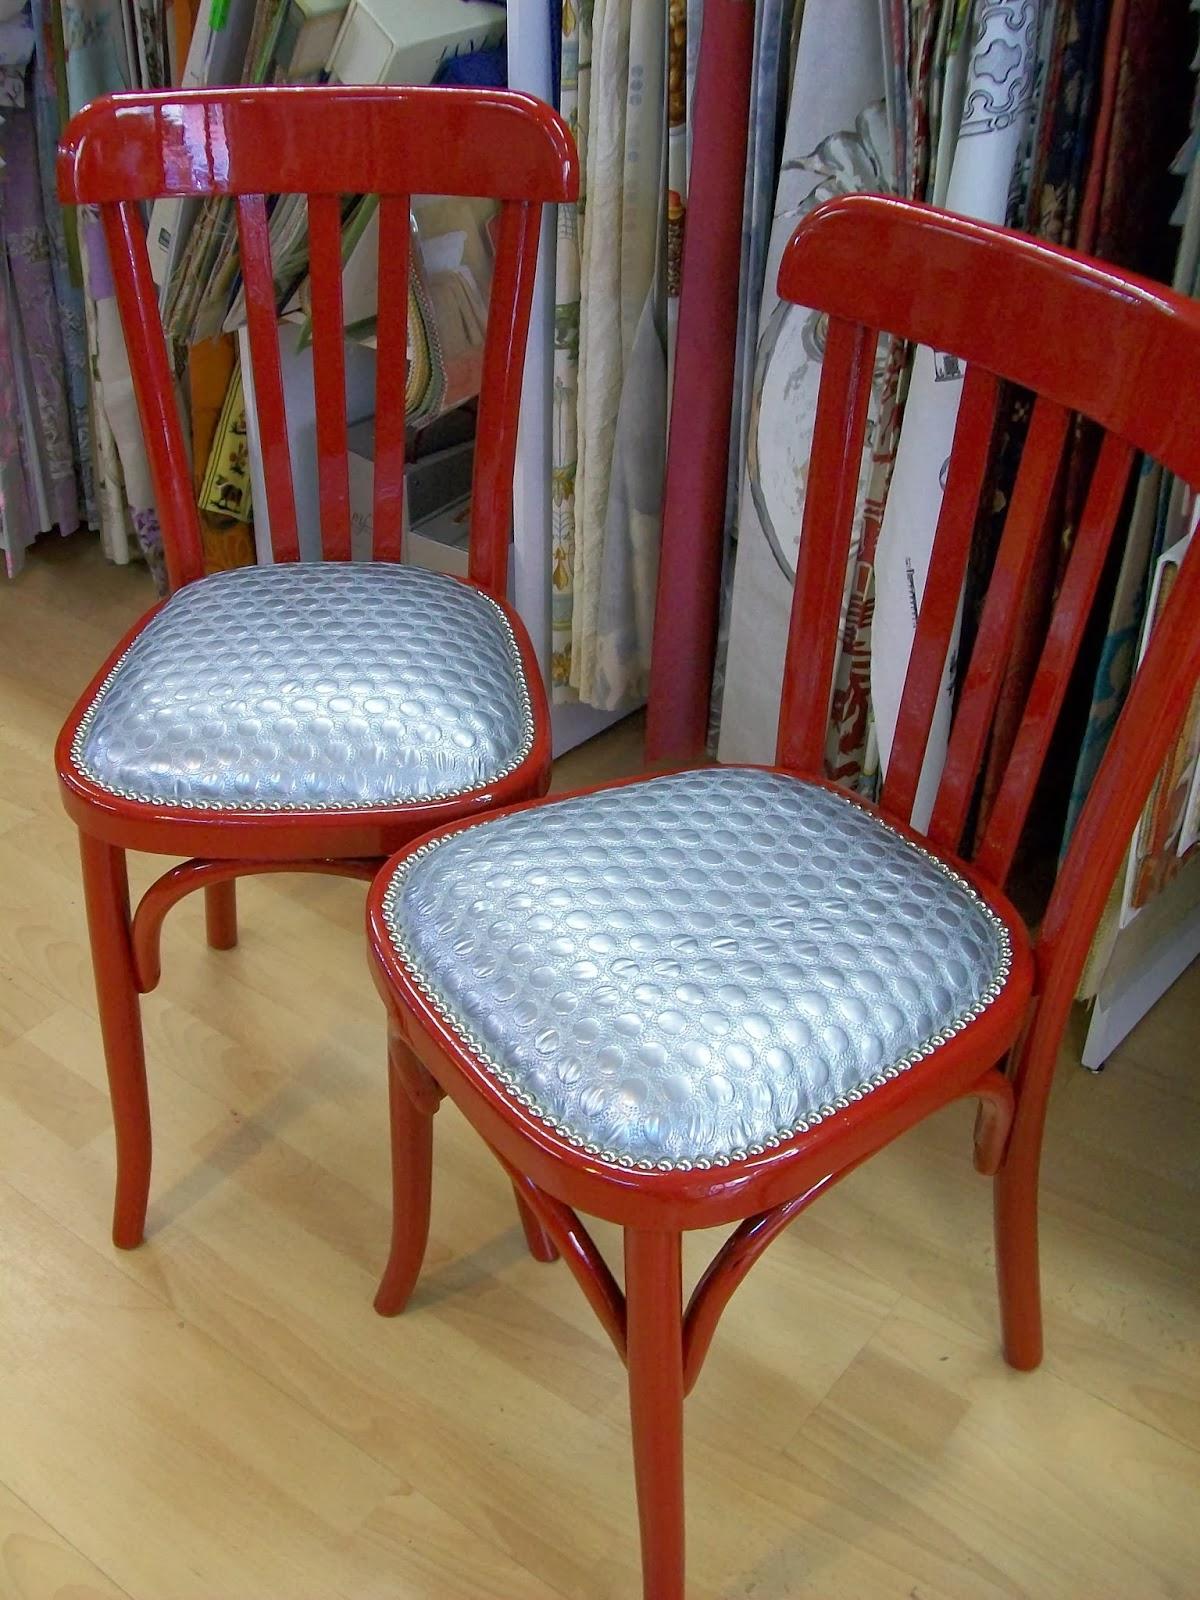 L'Atelier.créa: Chaise Bistrot avec Chaises Bistrot But